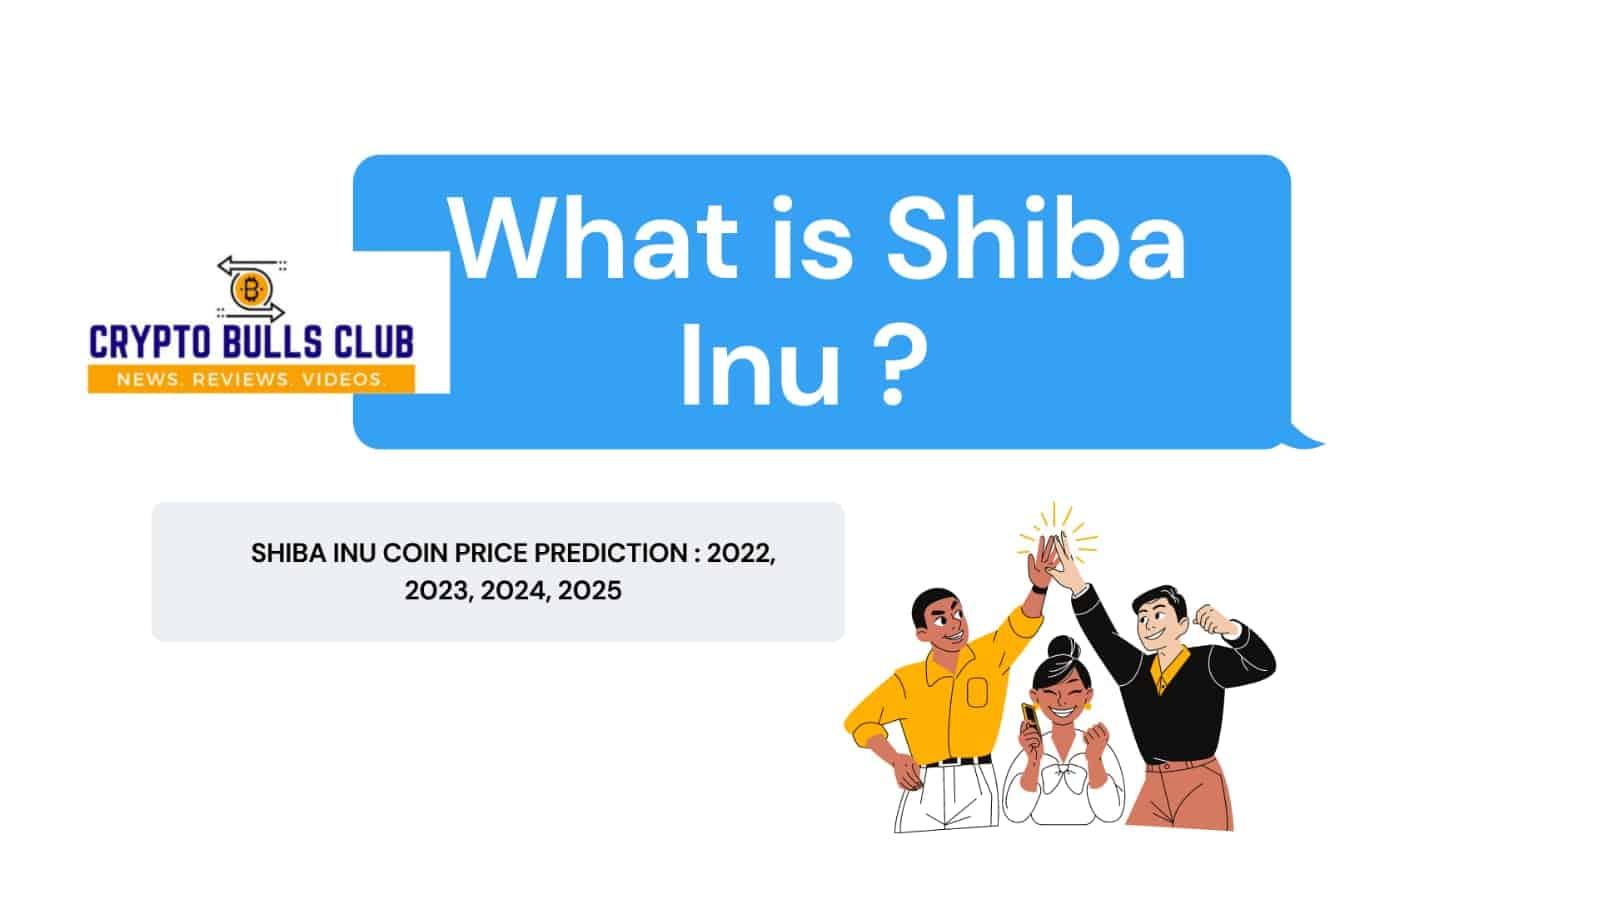 What is Shiba Inu ?